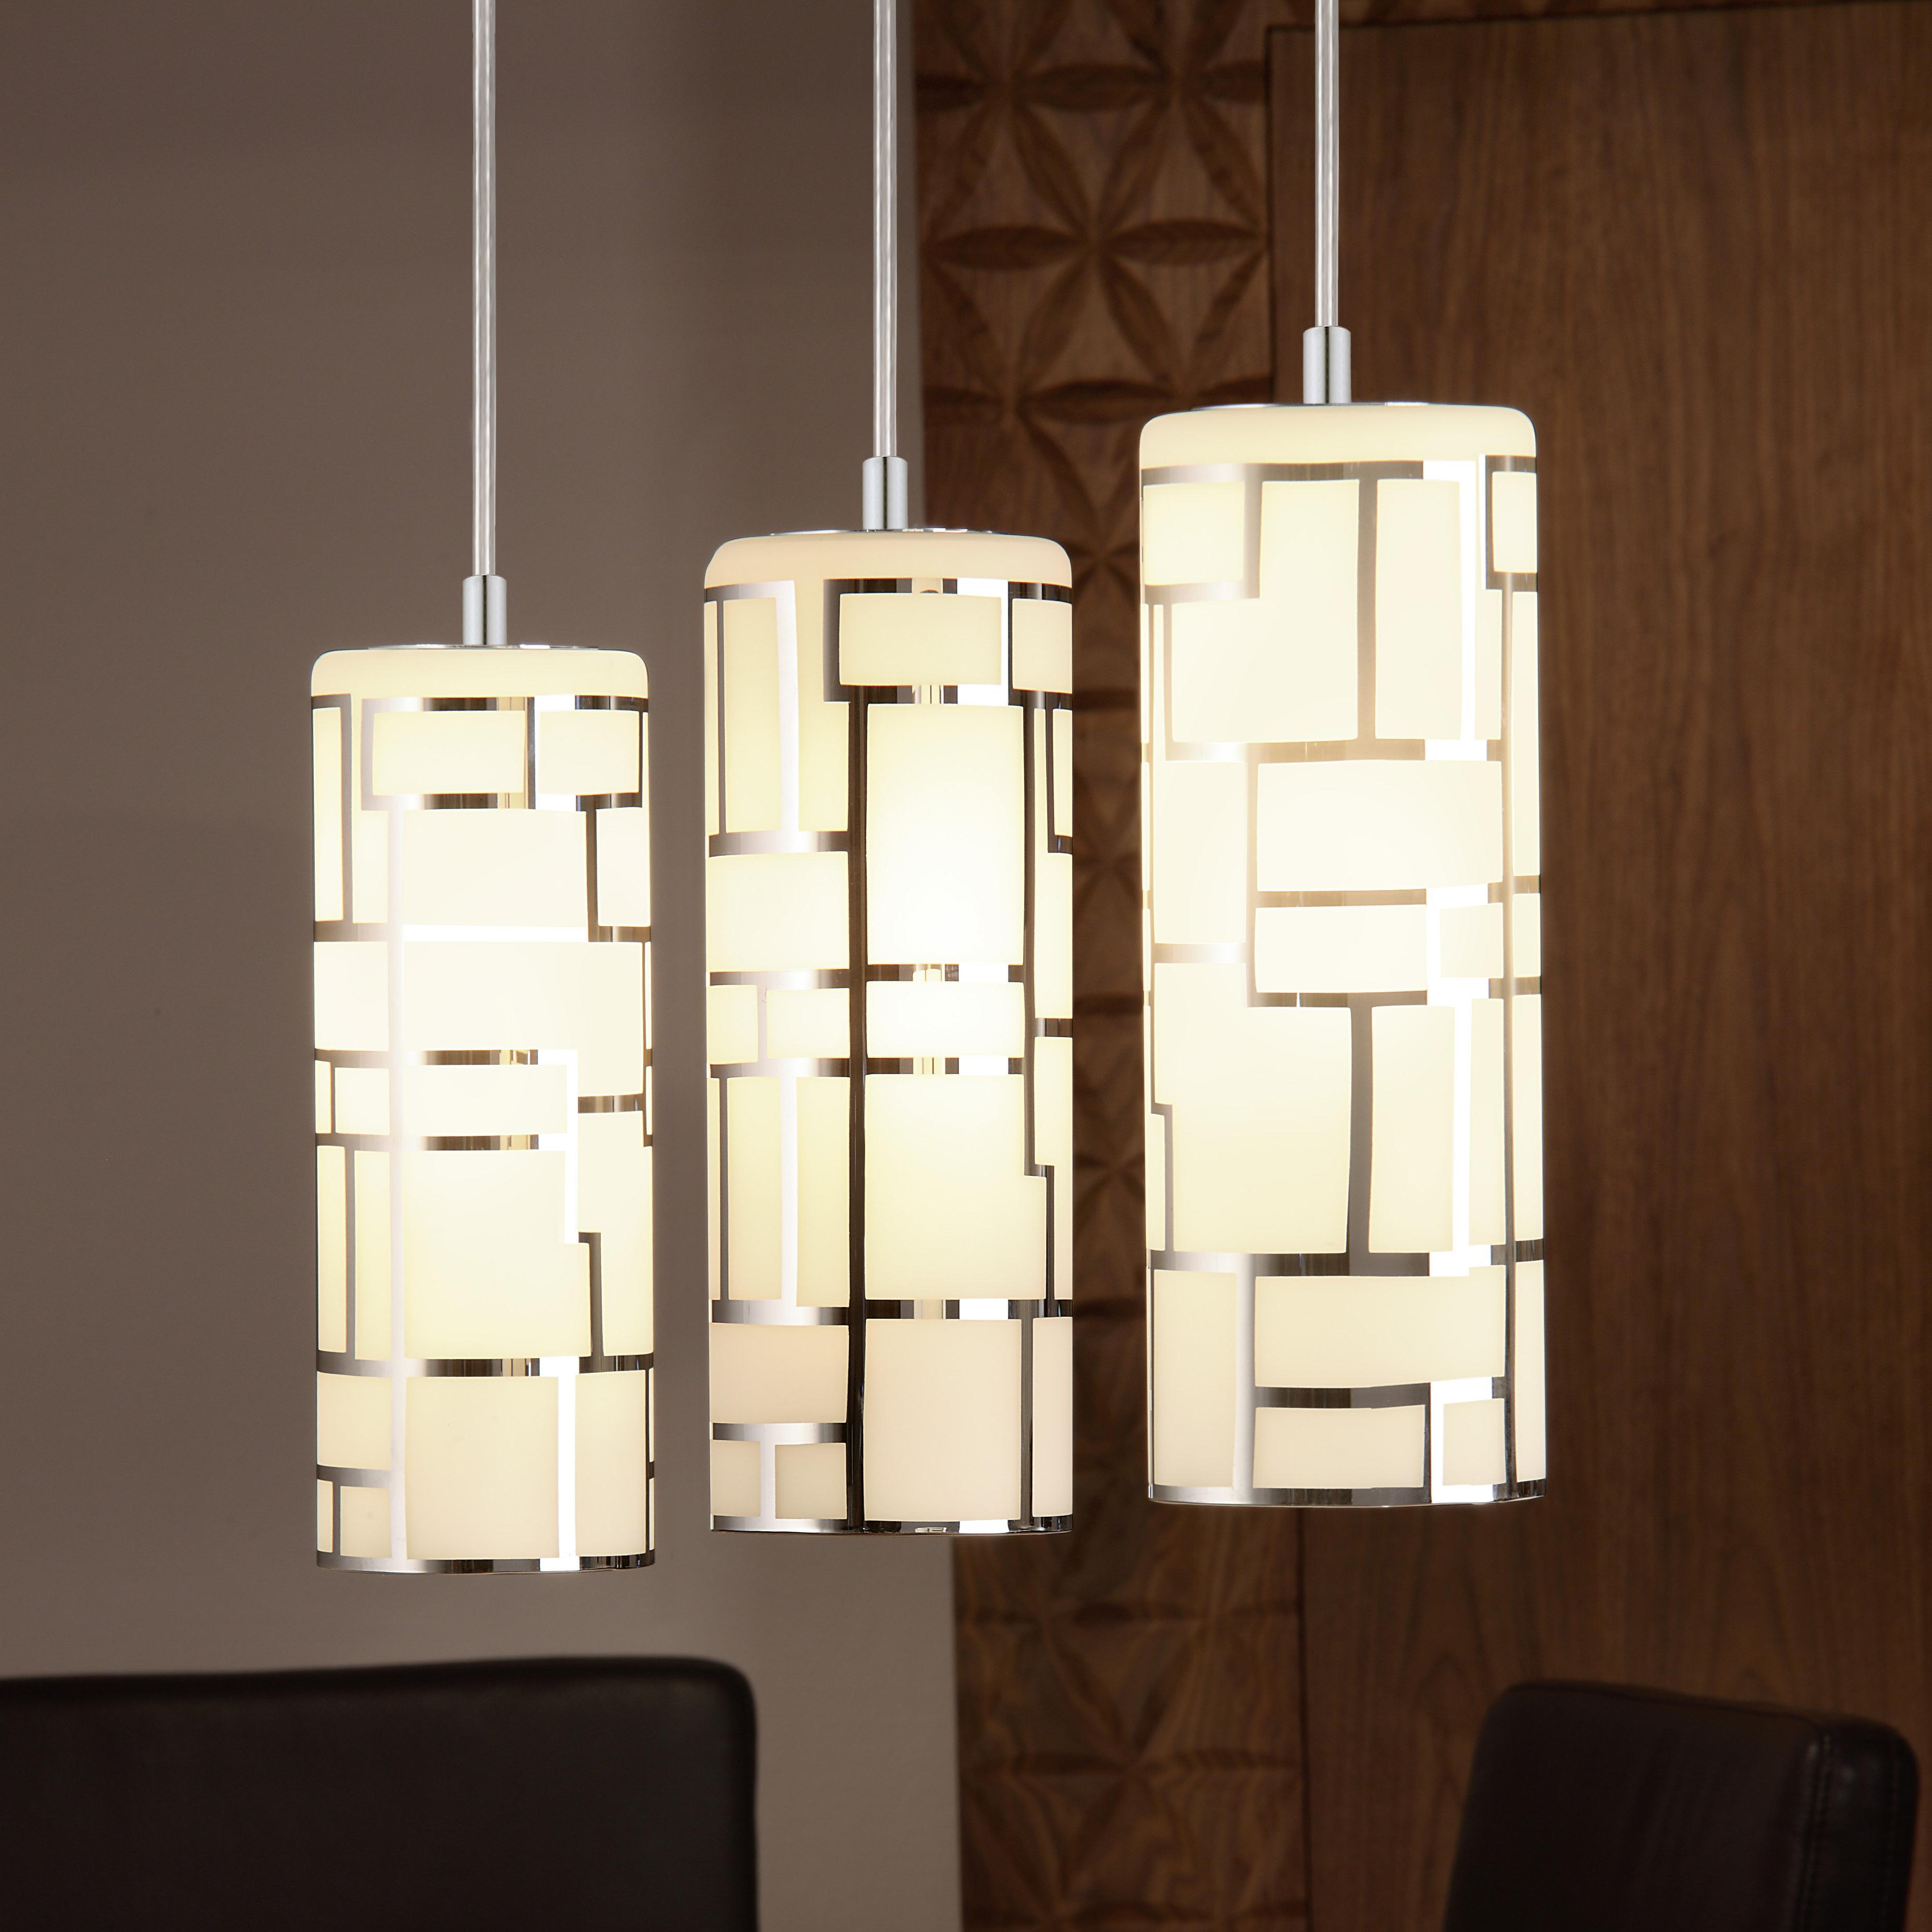 Kitchen Island Pendant Lighting Fixtures – Gnubies In Fashionable Ariel 2 Light Kitchen Island Dome Pendants (View 25 of 25)